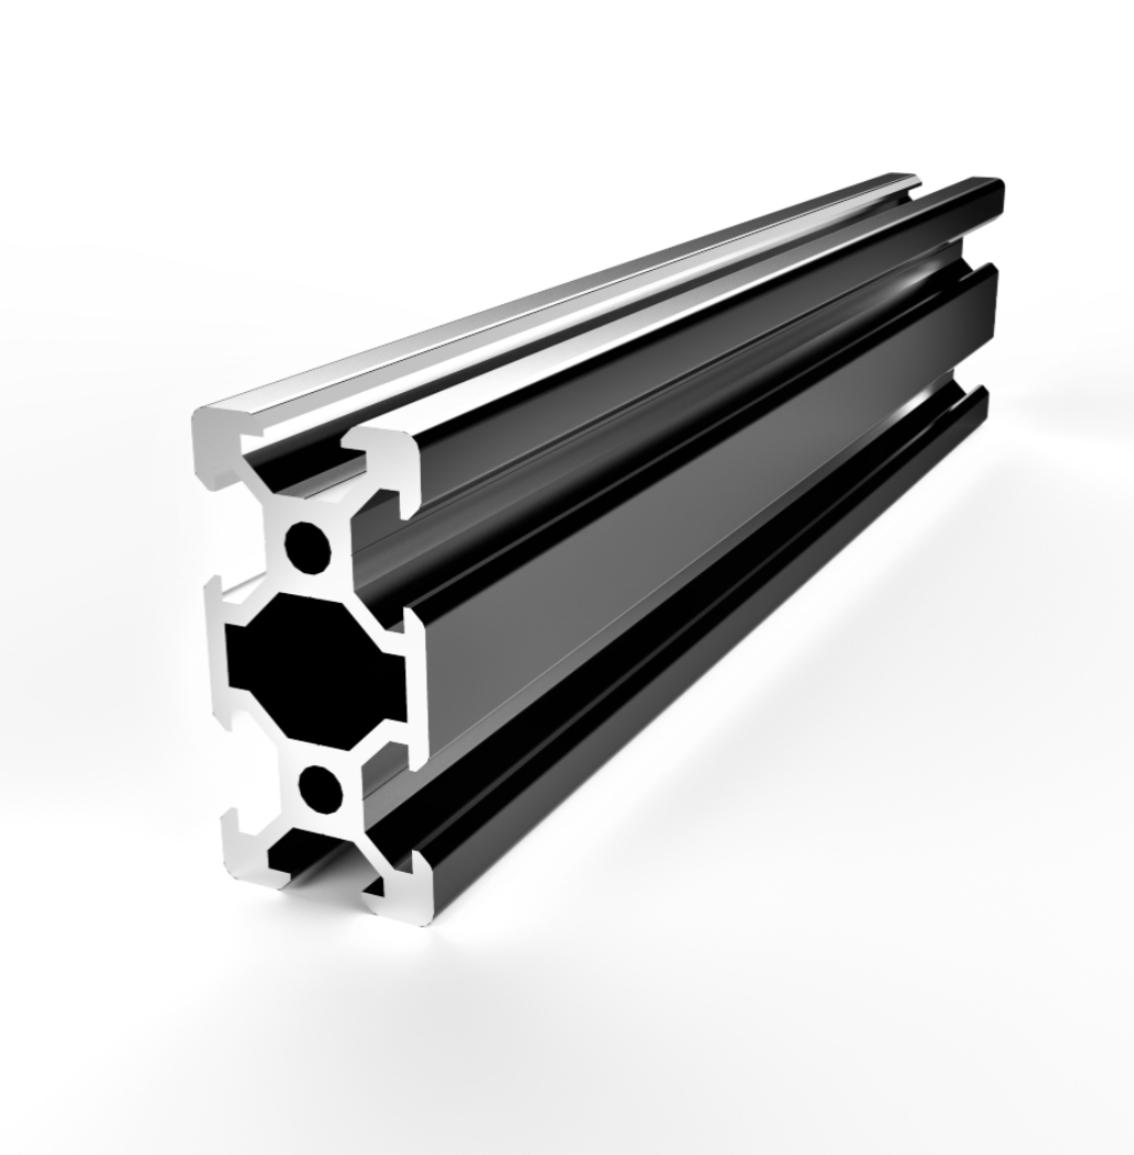 Perfil de Aluminio 2040 V-Slot